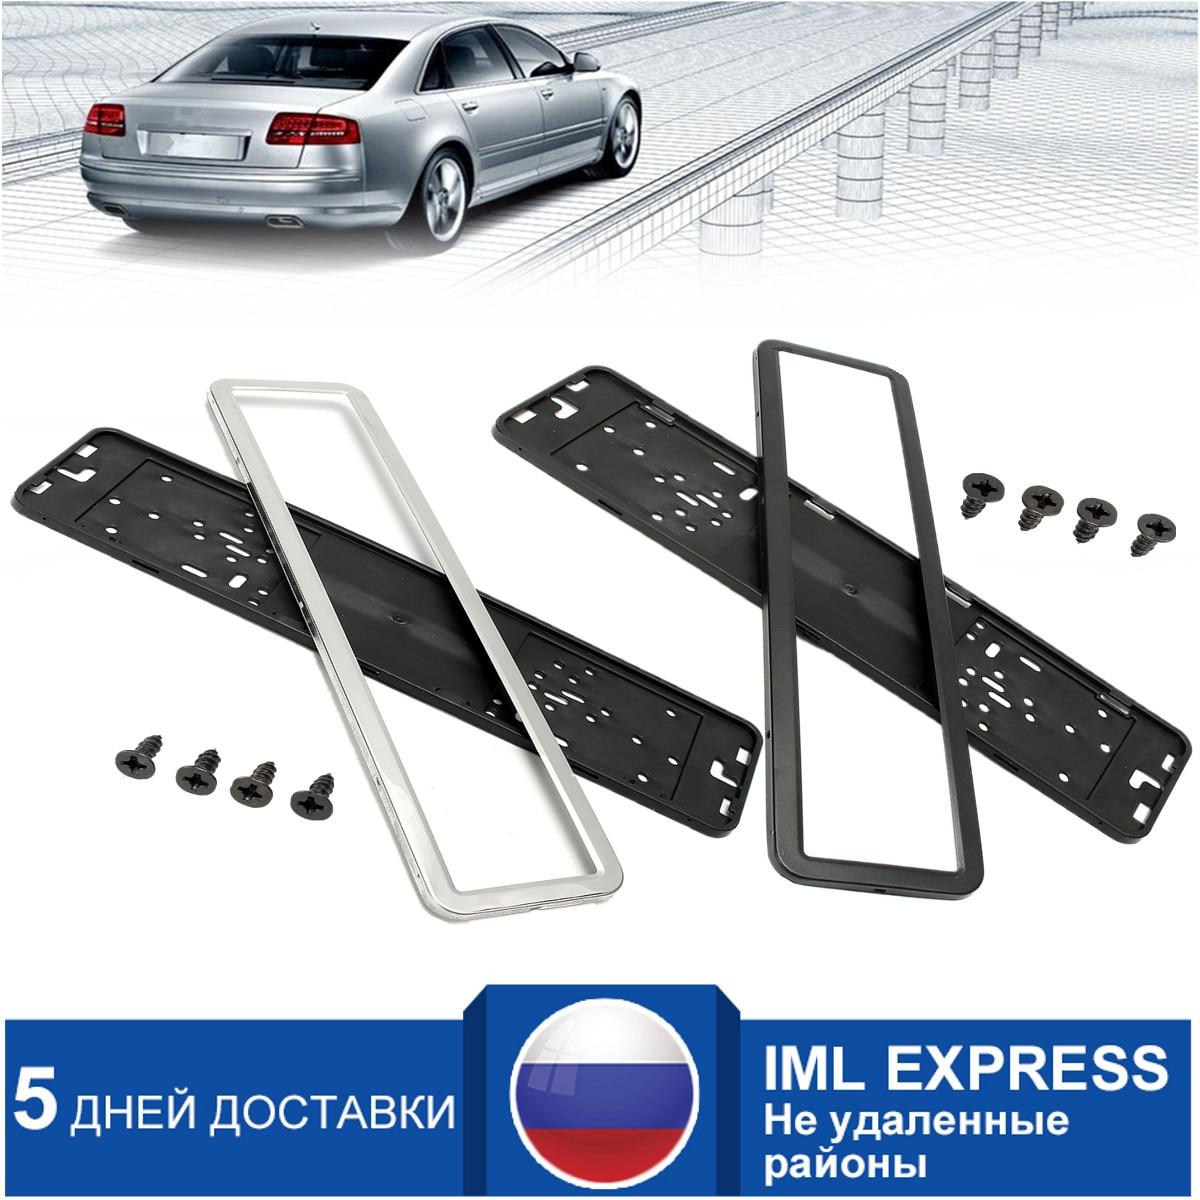 Metal Frame Steel Holder For European Euro License Plate Stainless New Nissan